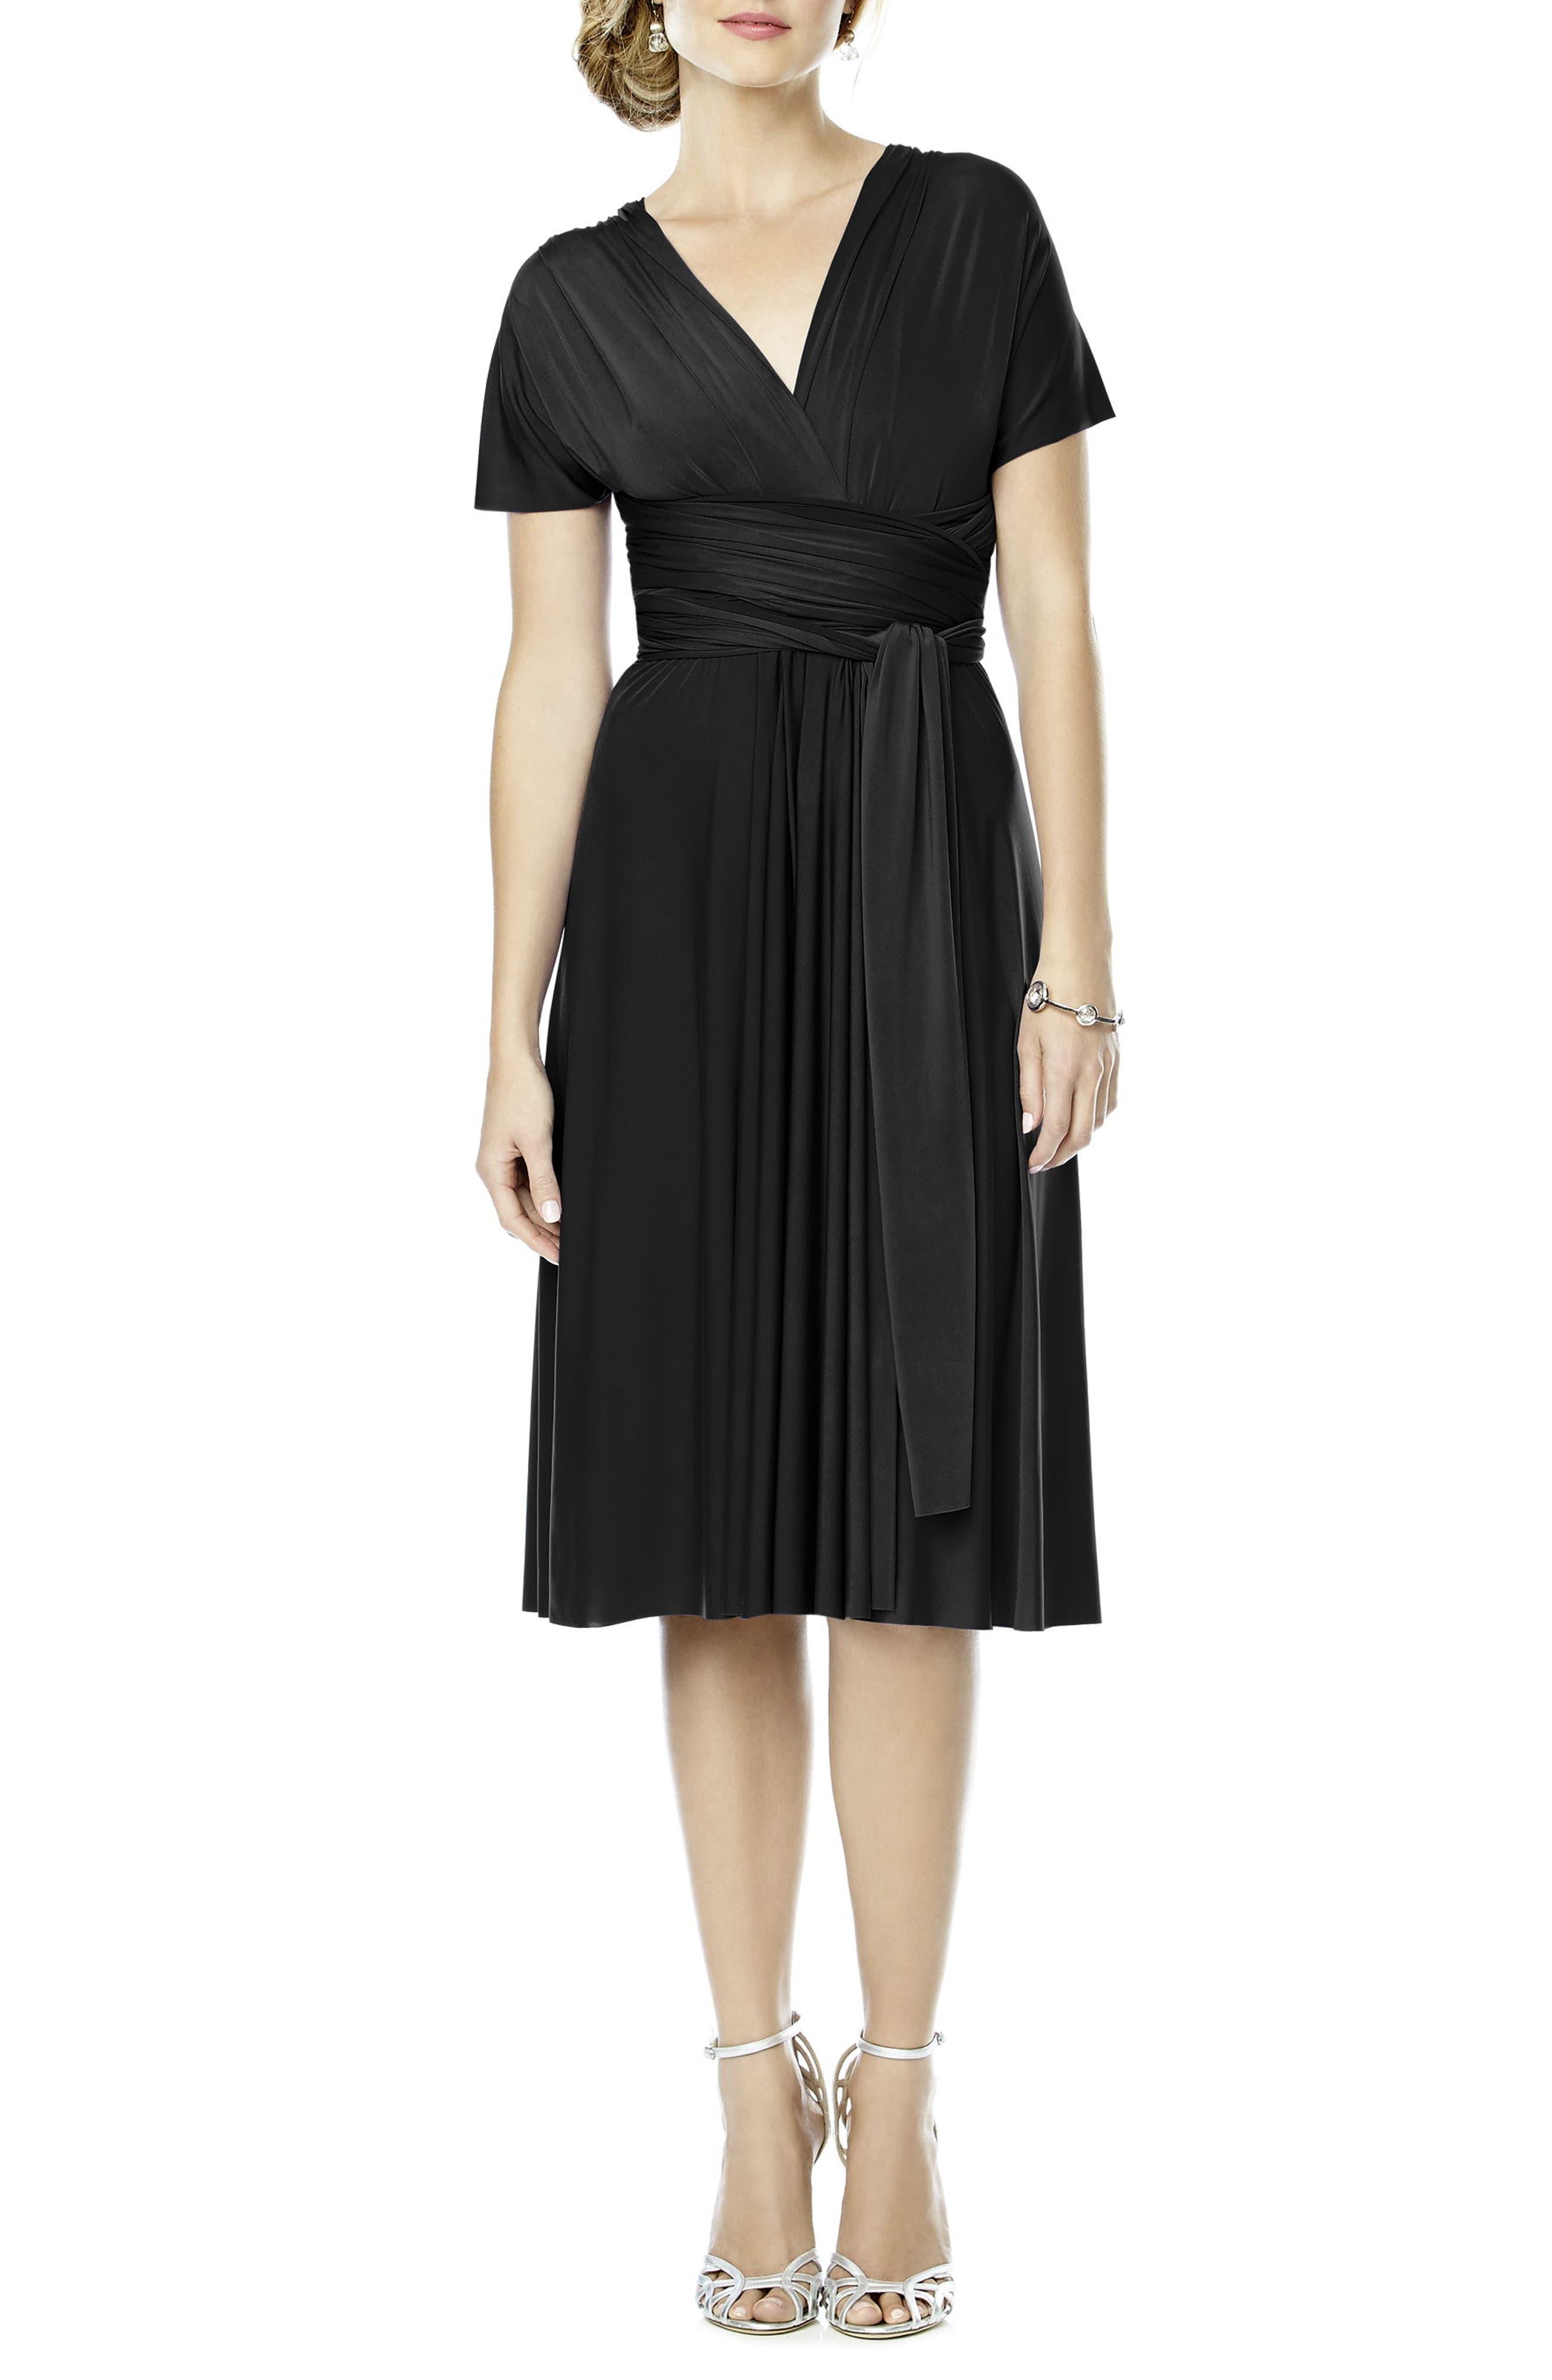 DESSY COLLECTION, Convertible Wrap Tie Surplice Jersey Dress, Main thumbnail 1, color, 001